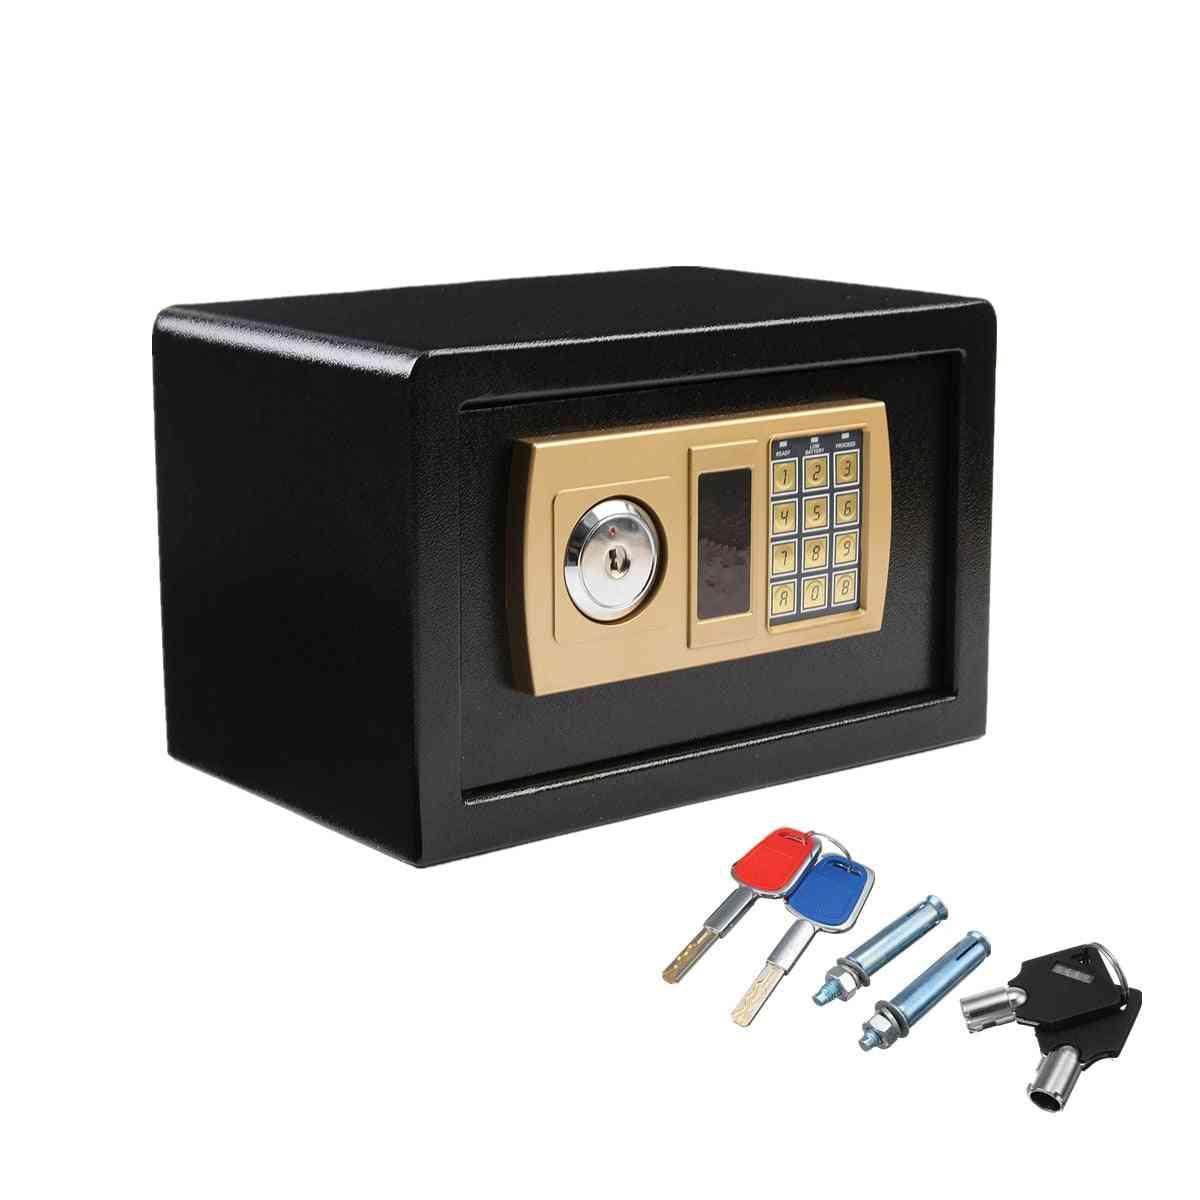 Digital Safe Box Fire Proof, Ideal Security Secret Electronic Password